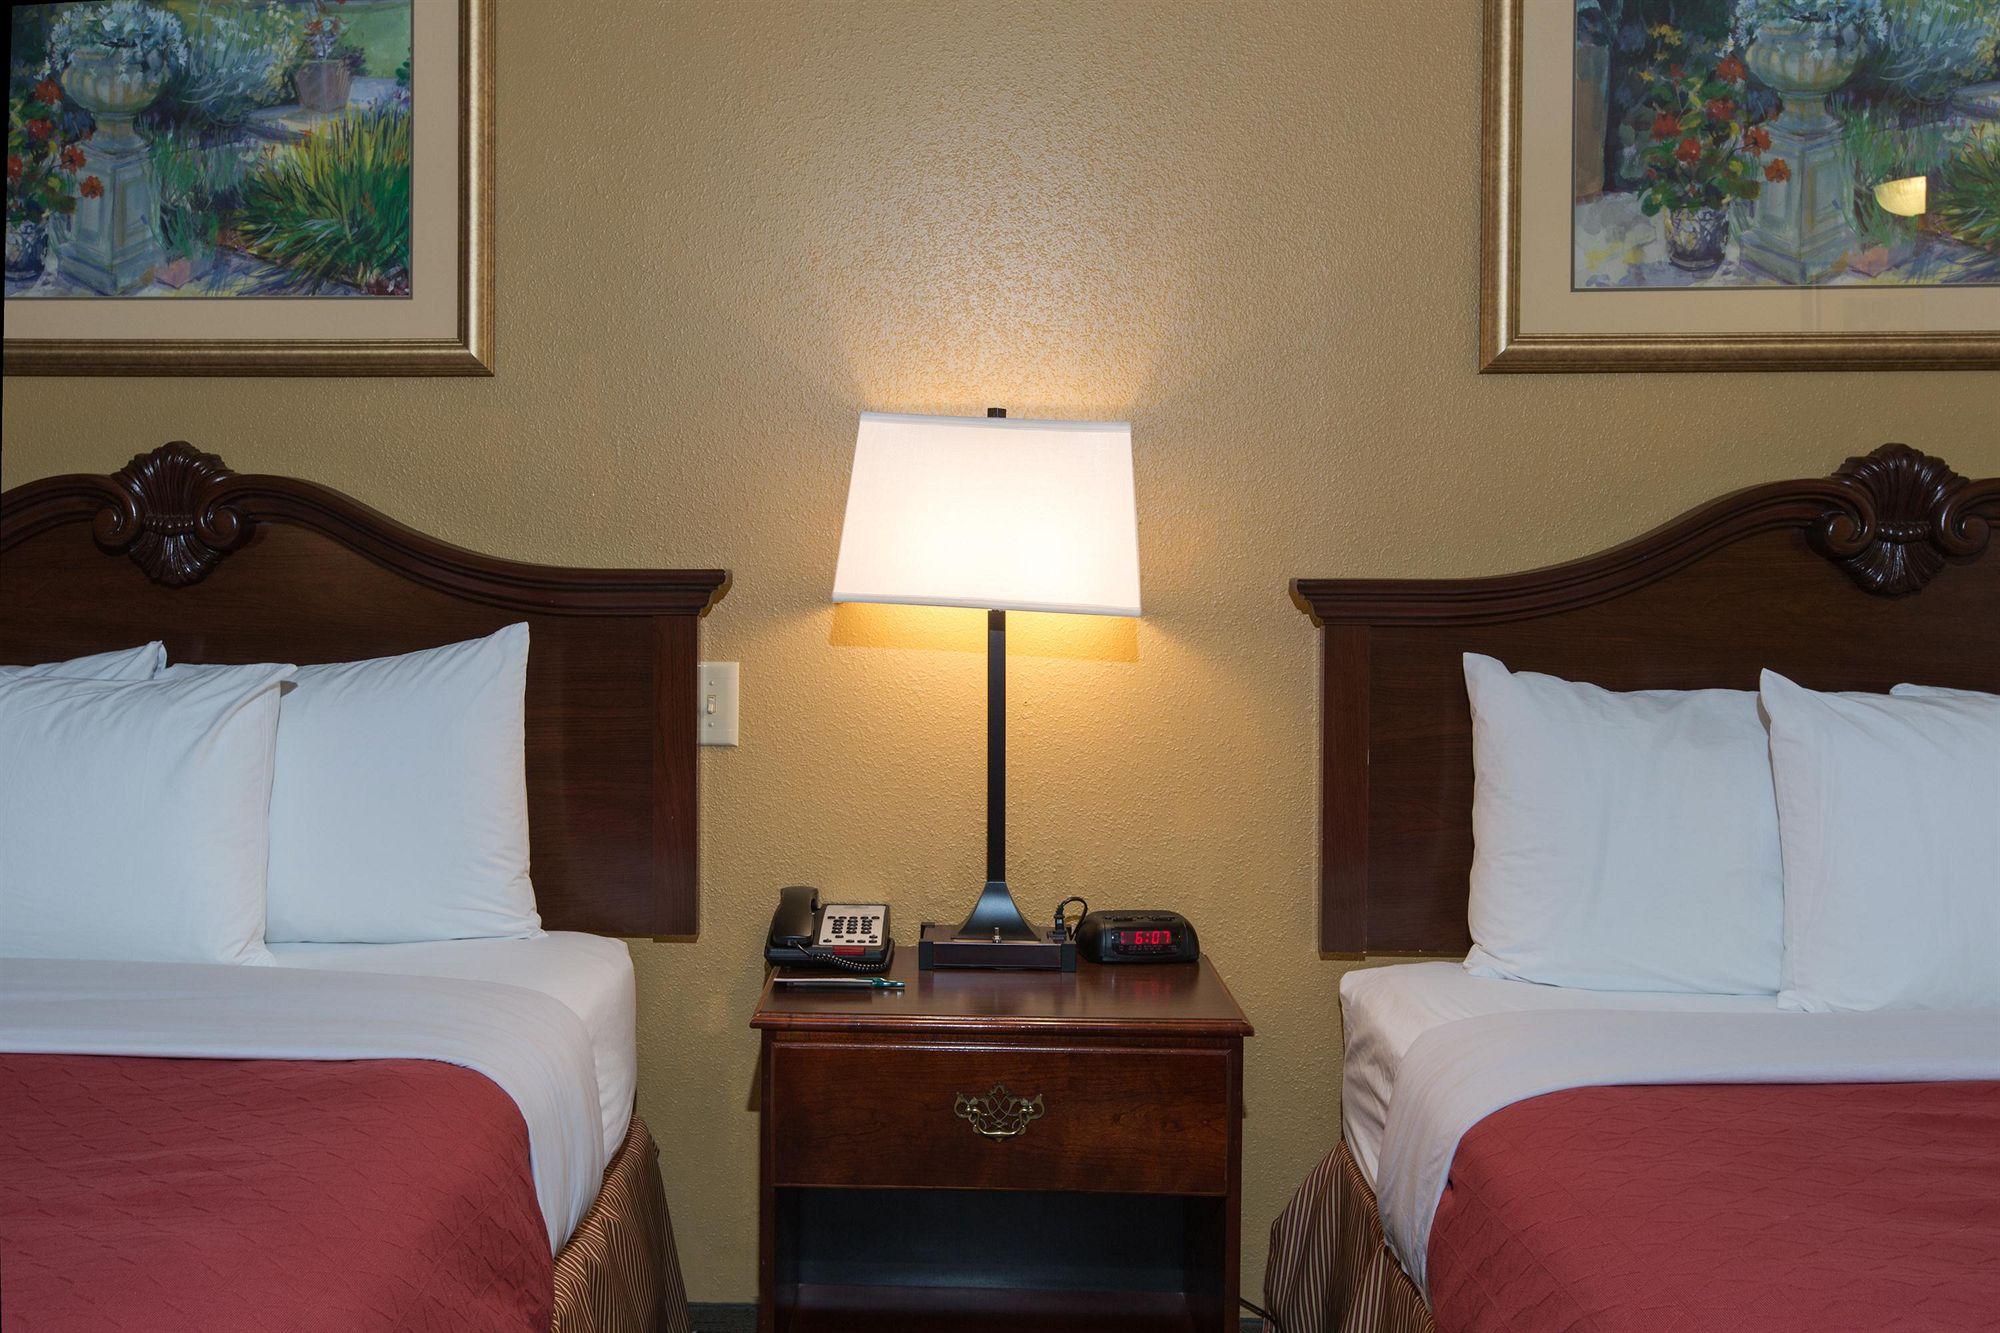 Country Inn & Suites in Lumberton, NC